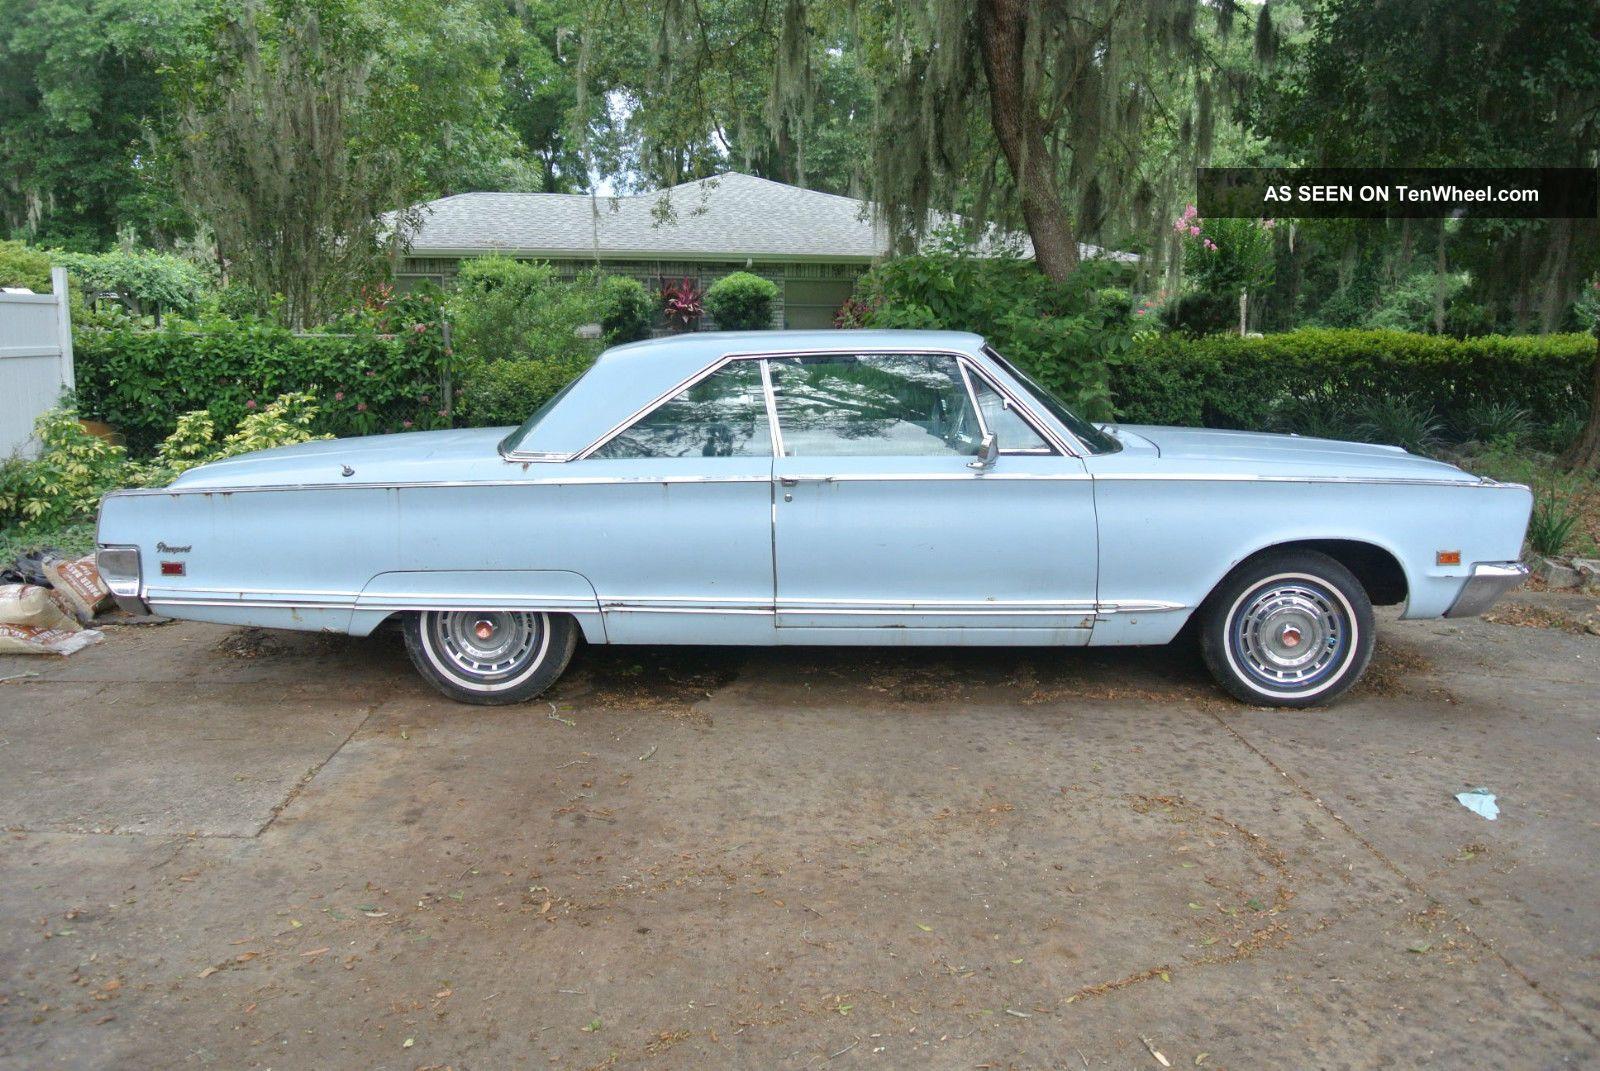 1966 Chrysler Newport Coupe